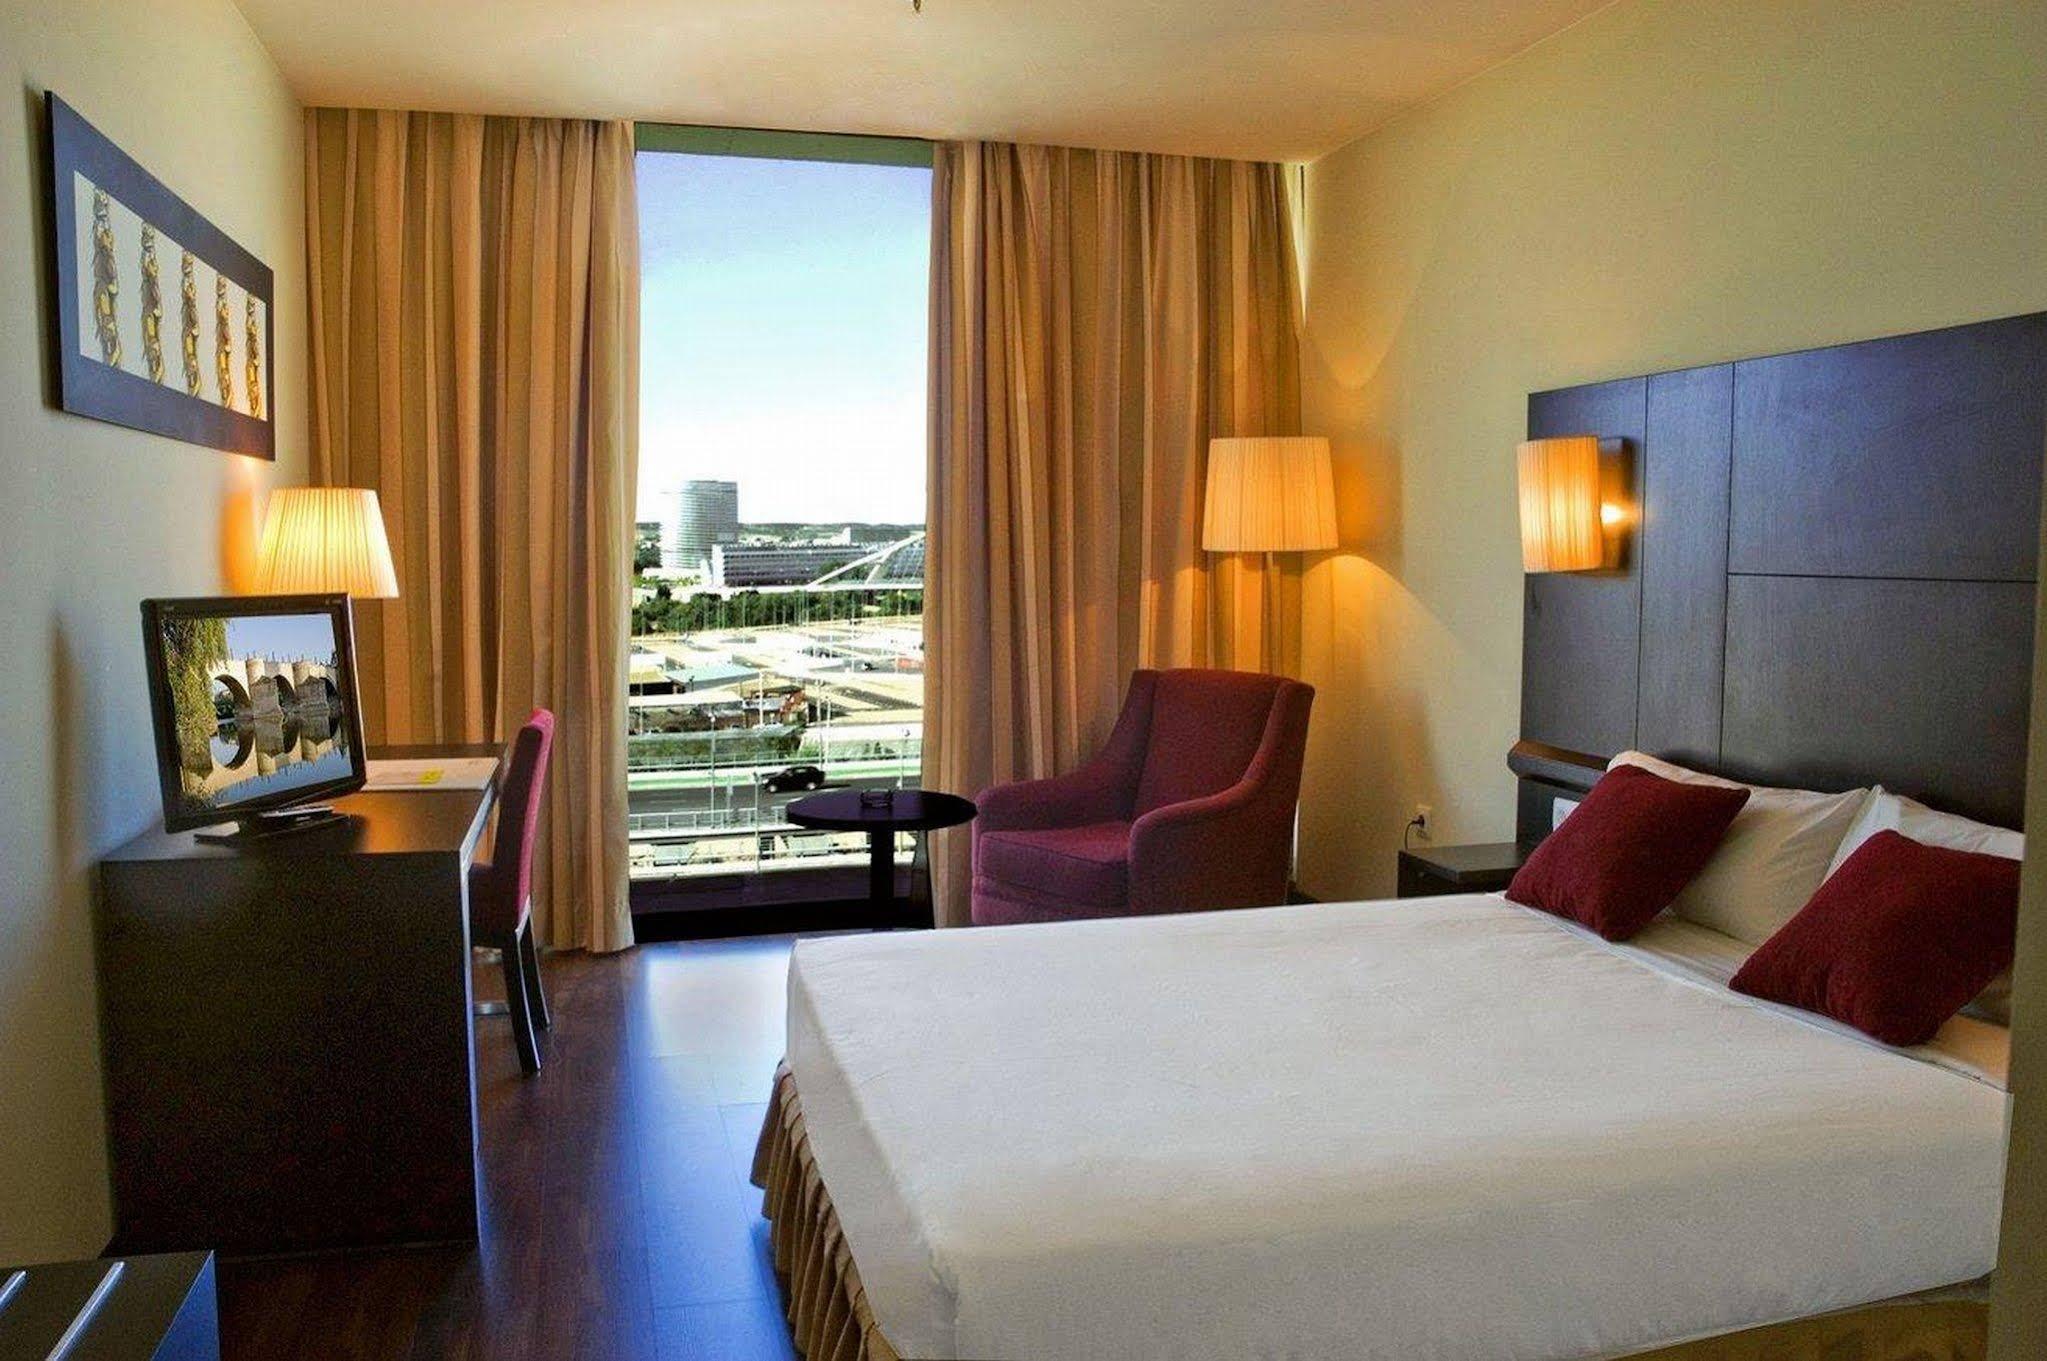 Hotel Husa Puerta de Zaragoza